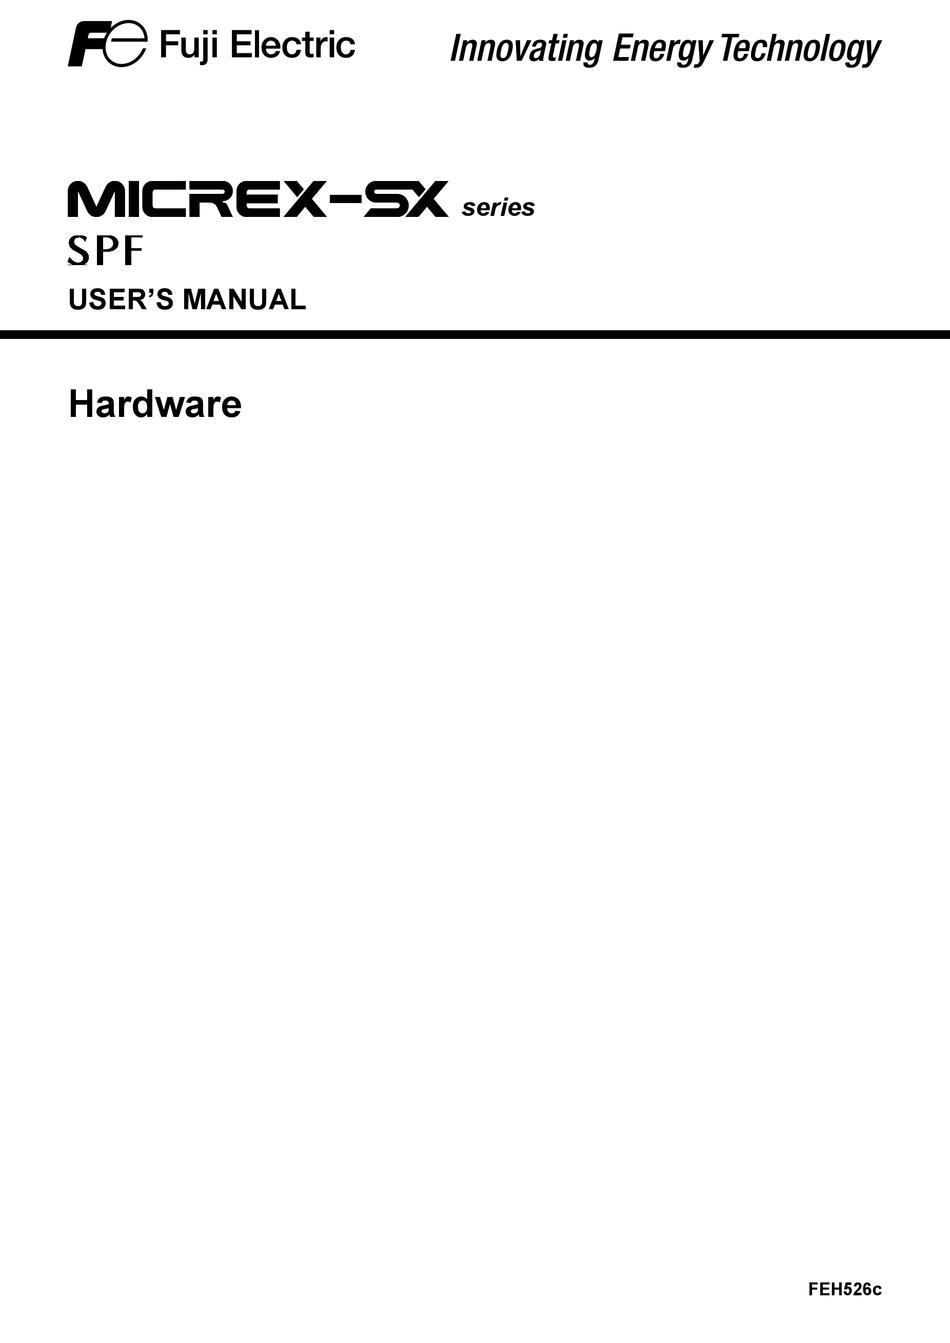 FUJI ELECTRIC MICREX-SX SERIES SPF USER MANUAL Pdf